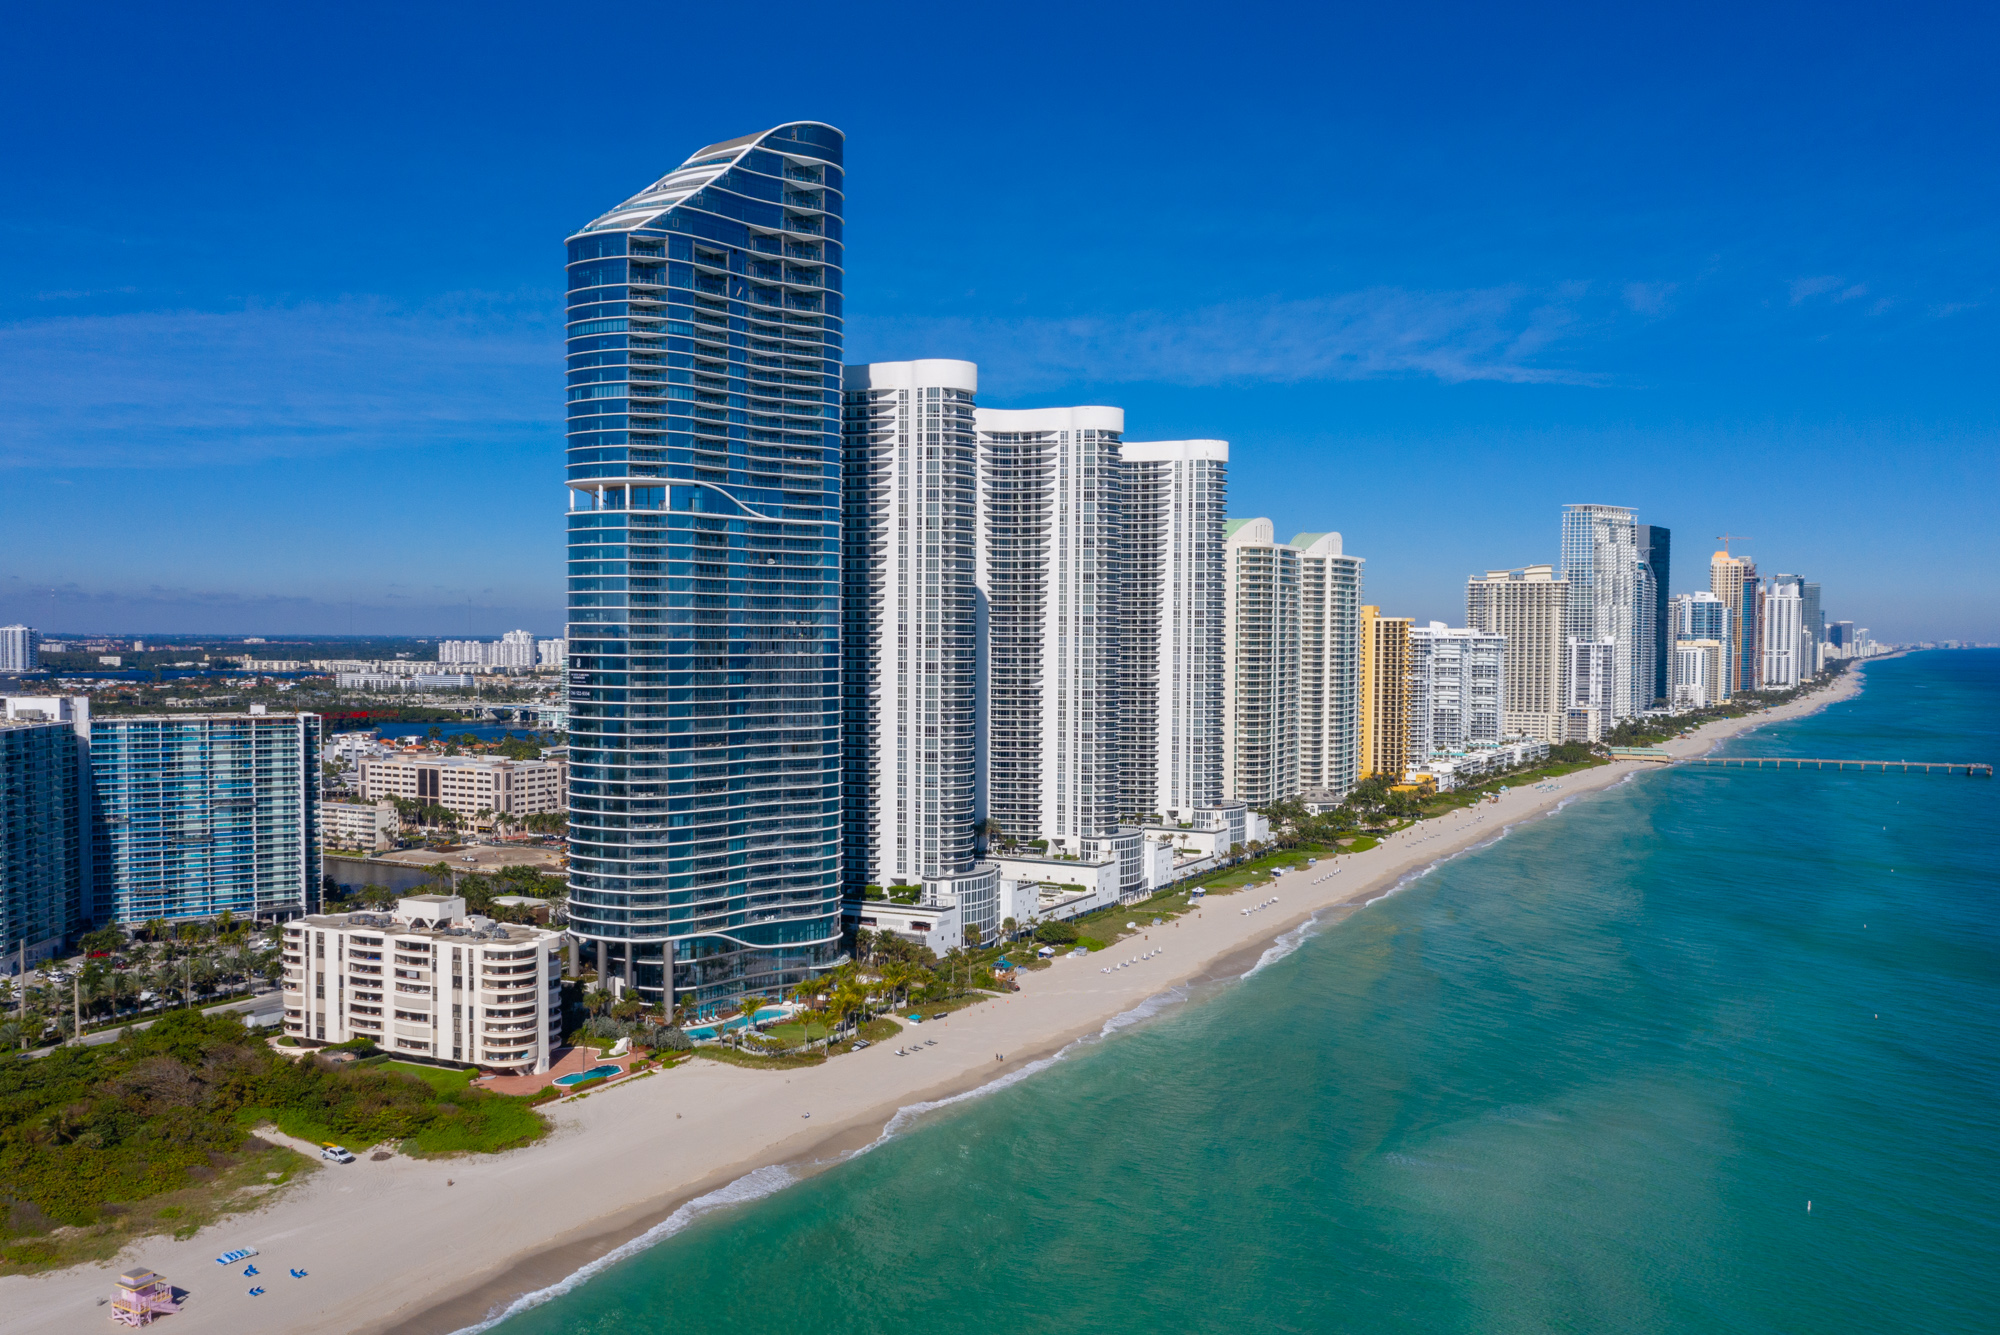 Imagen del exterior Ritz Carlton Residences Miami